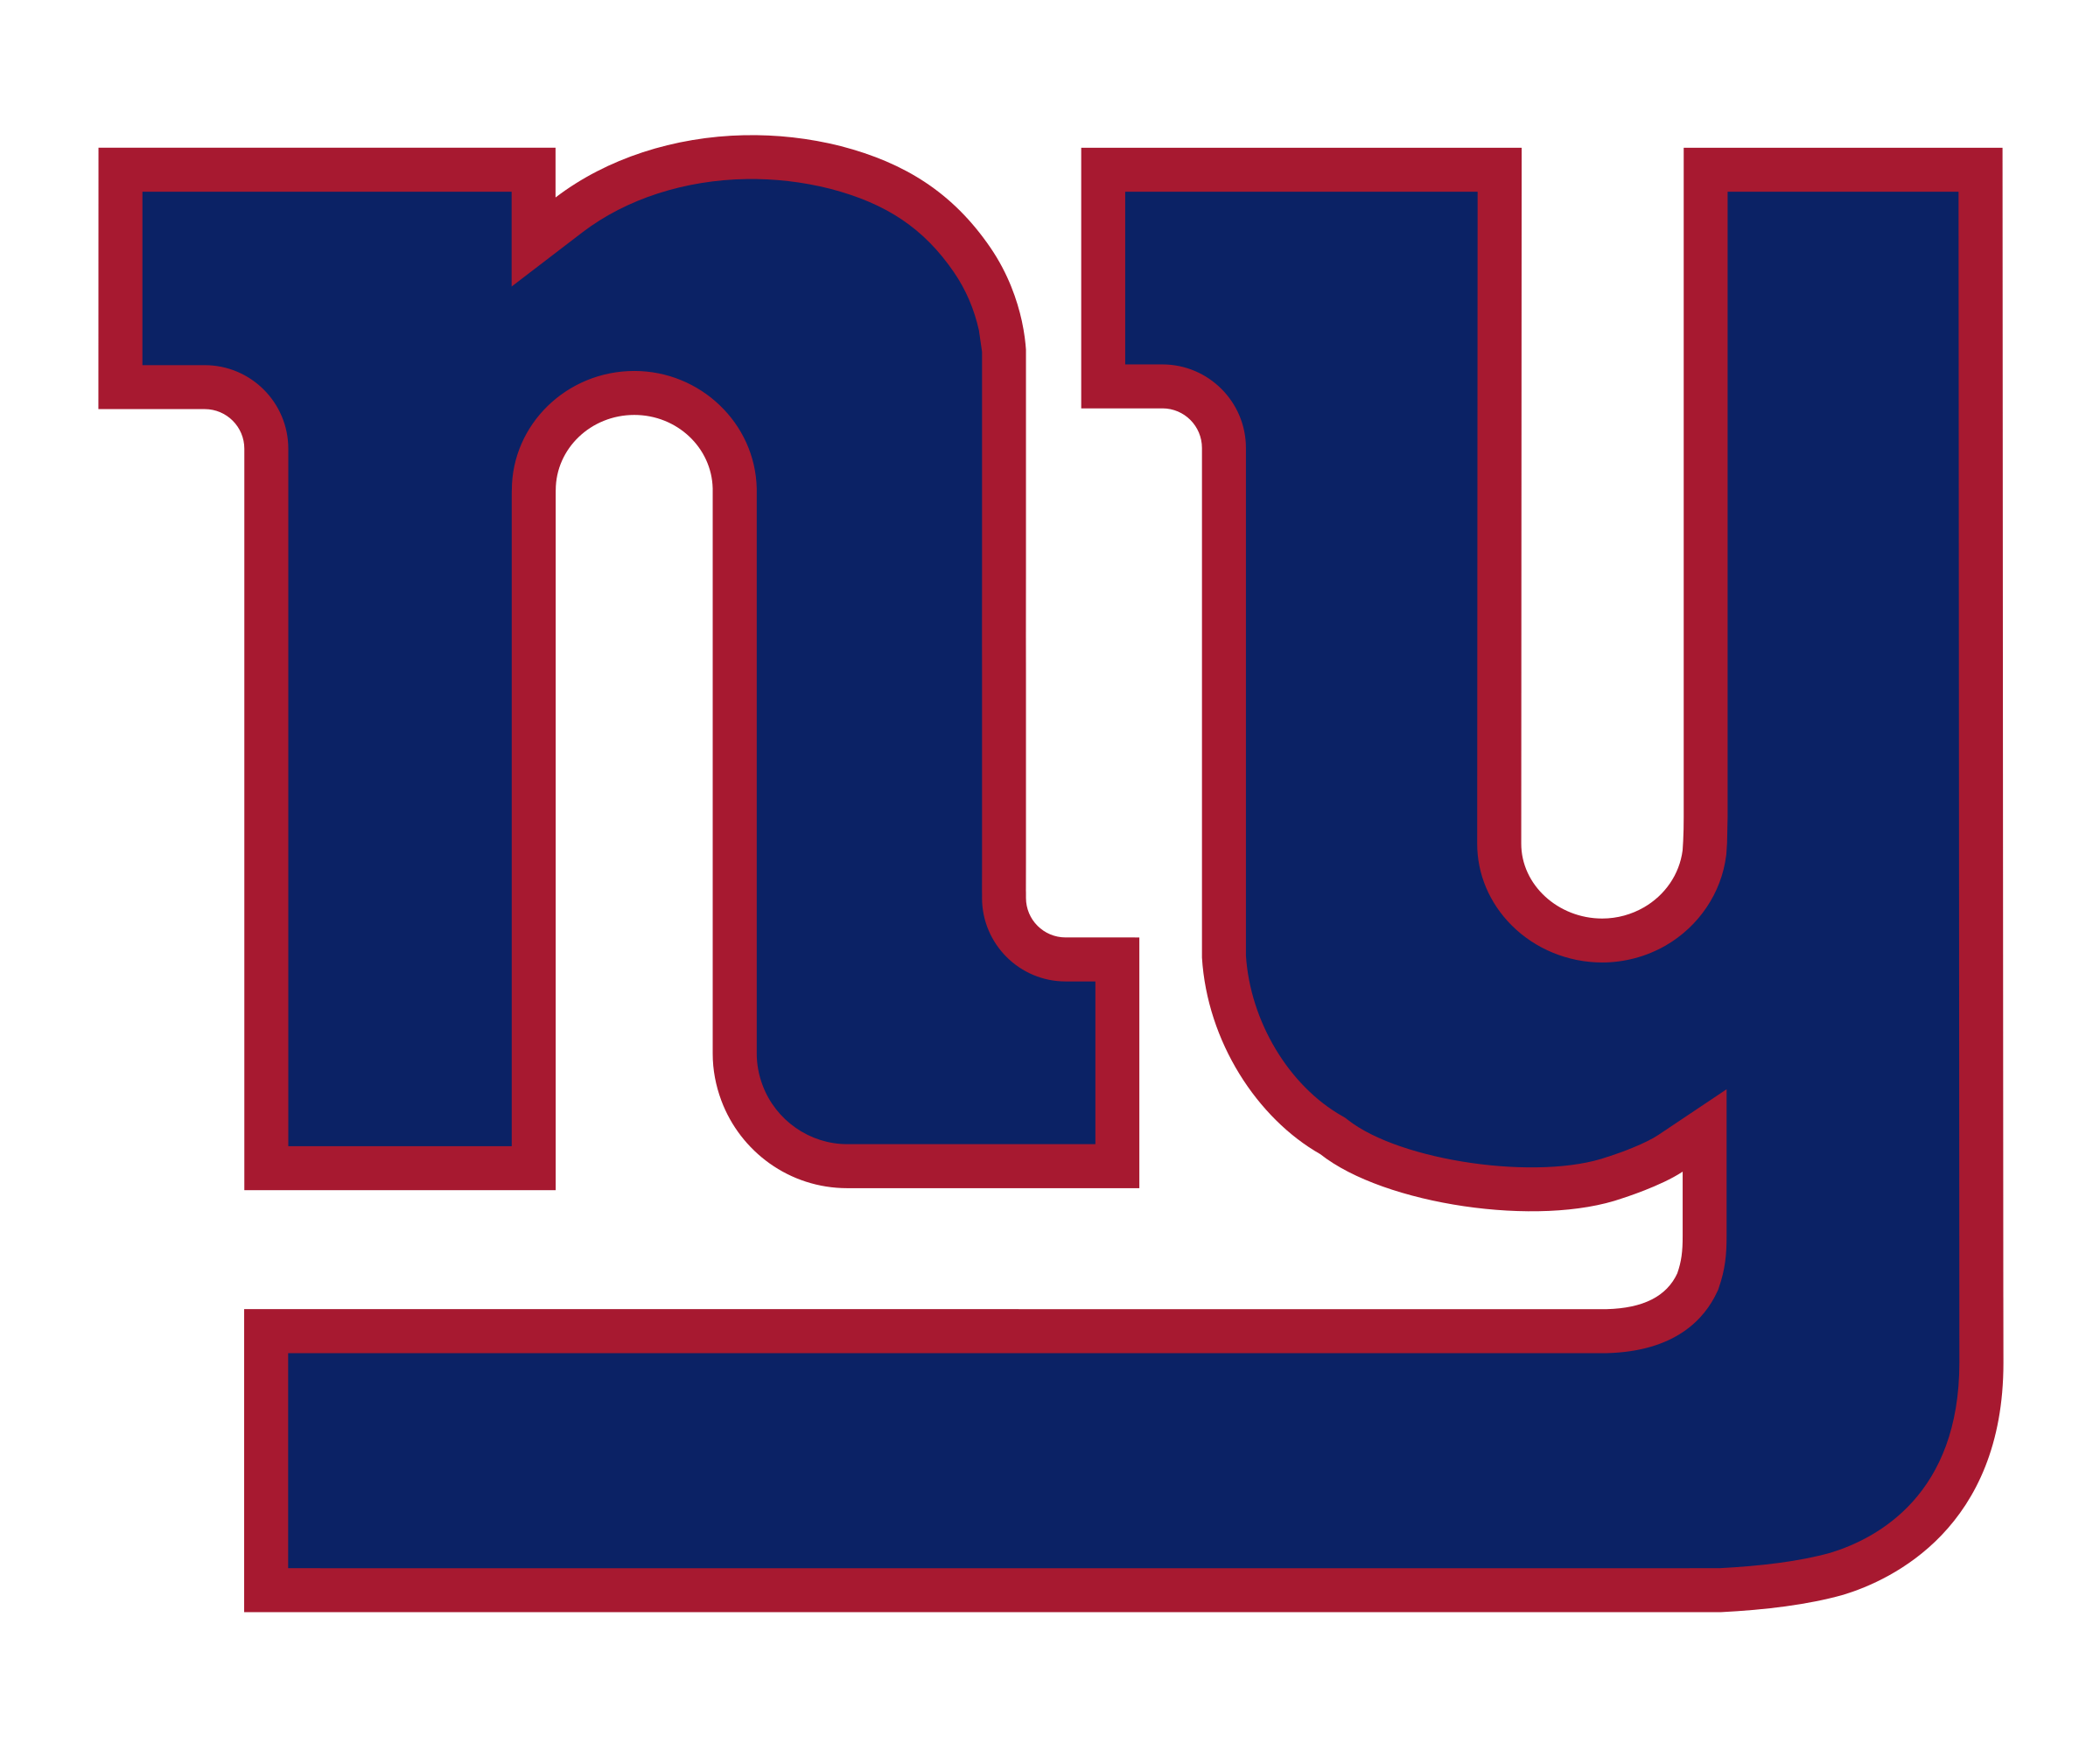 New York Giants Logo PNG Transparent & SVG Vector.